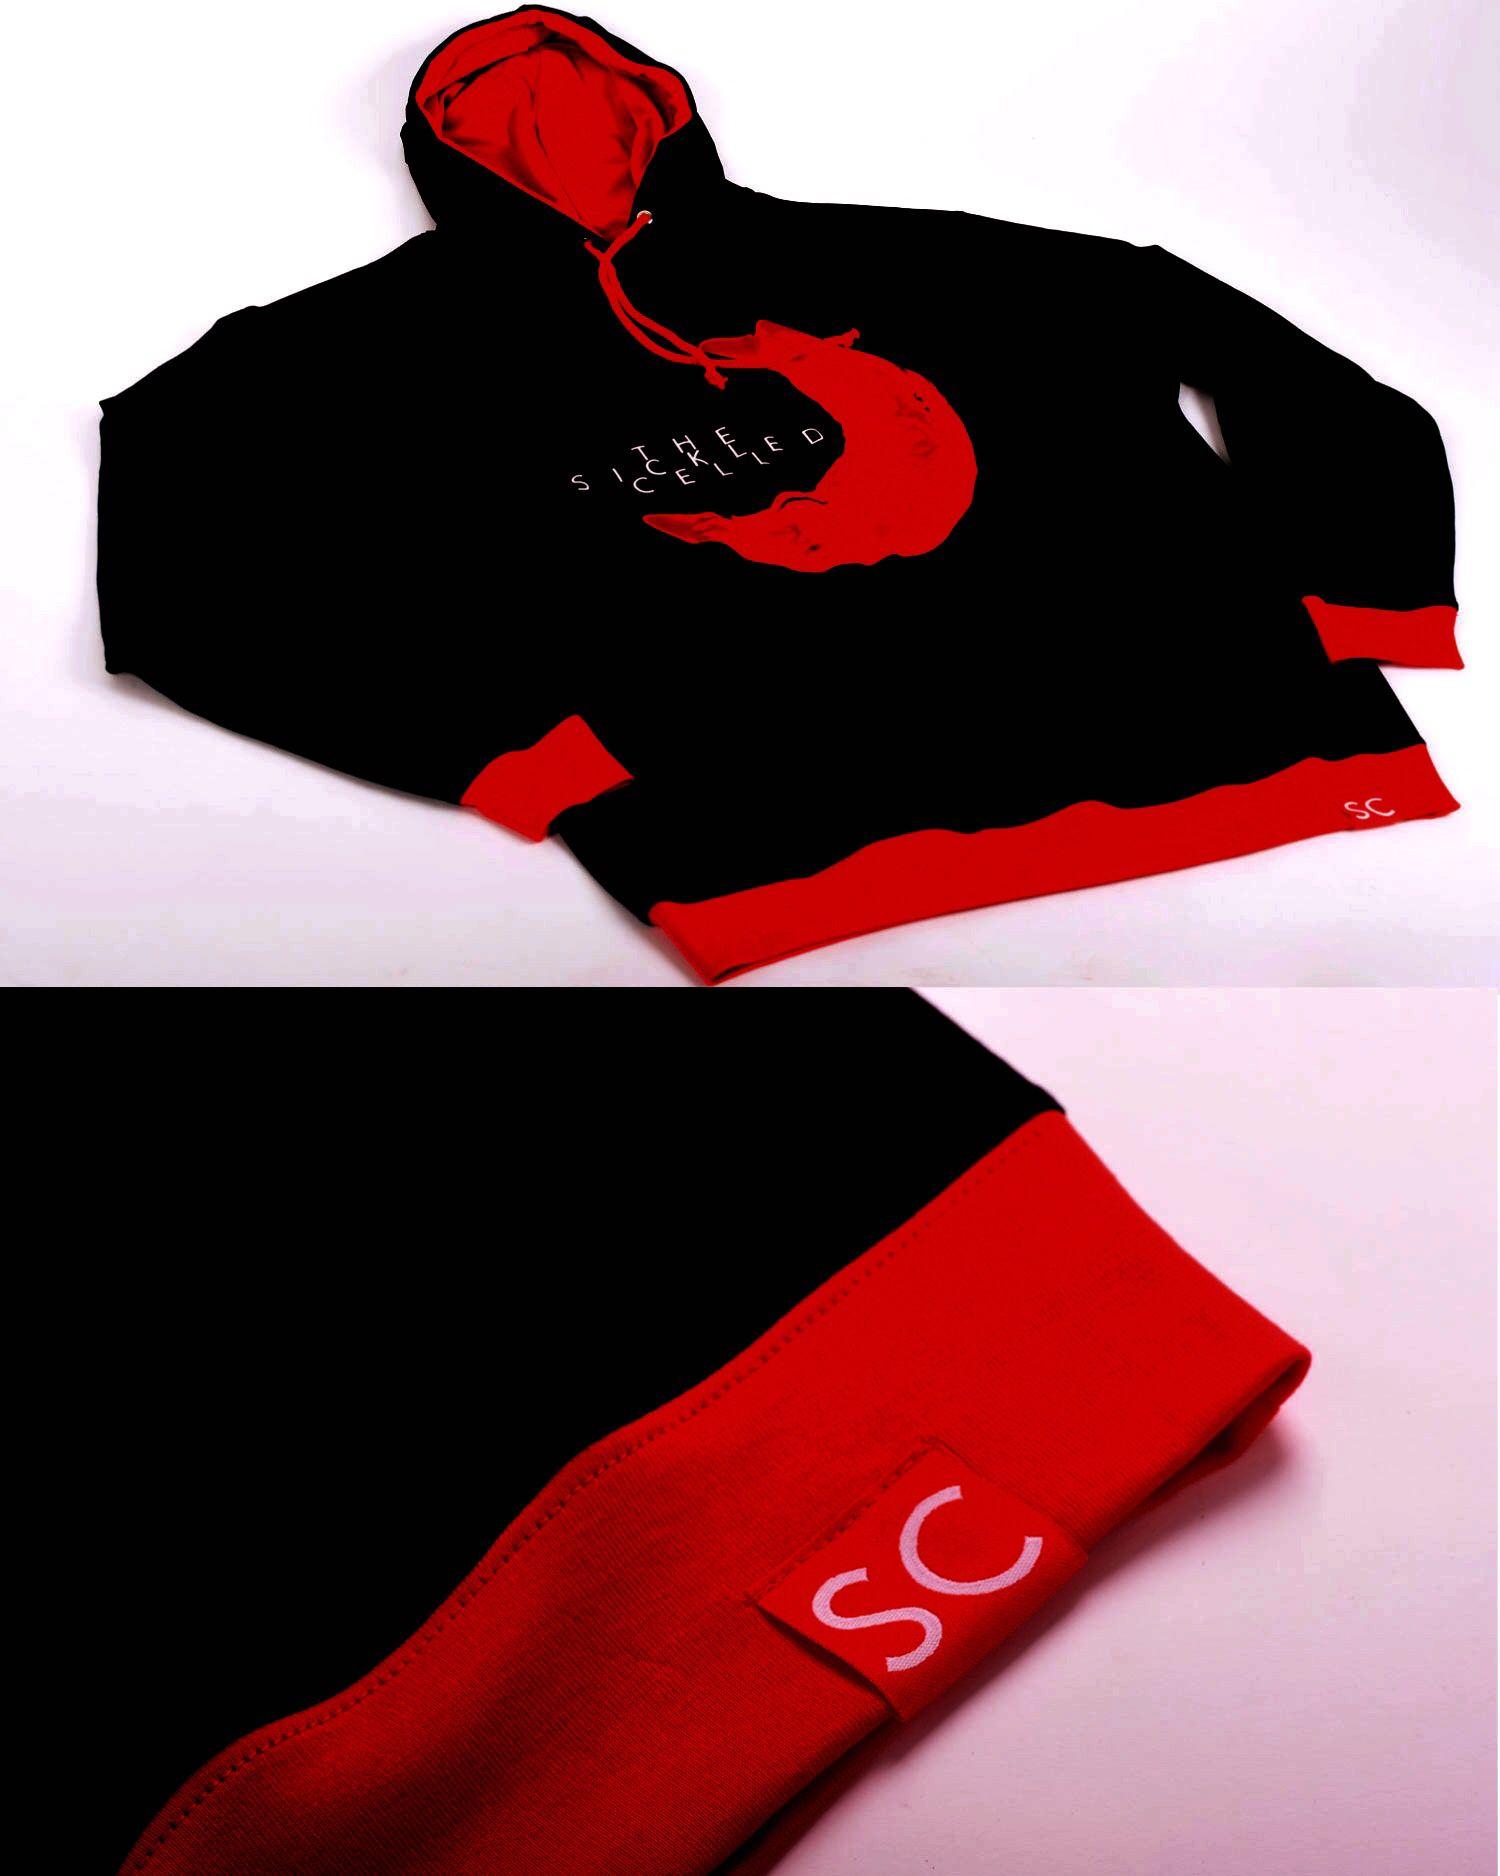 81eef9268 #hypebeast #streetwear #fashion #brand #branding #streetstyle #clothing